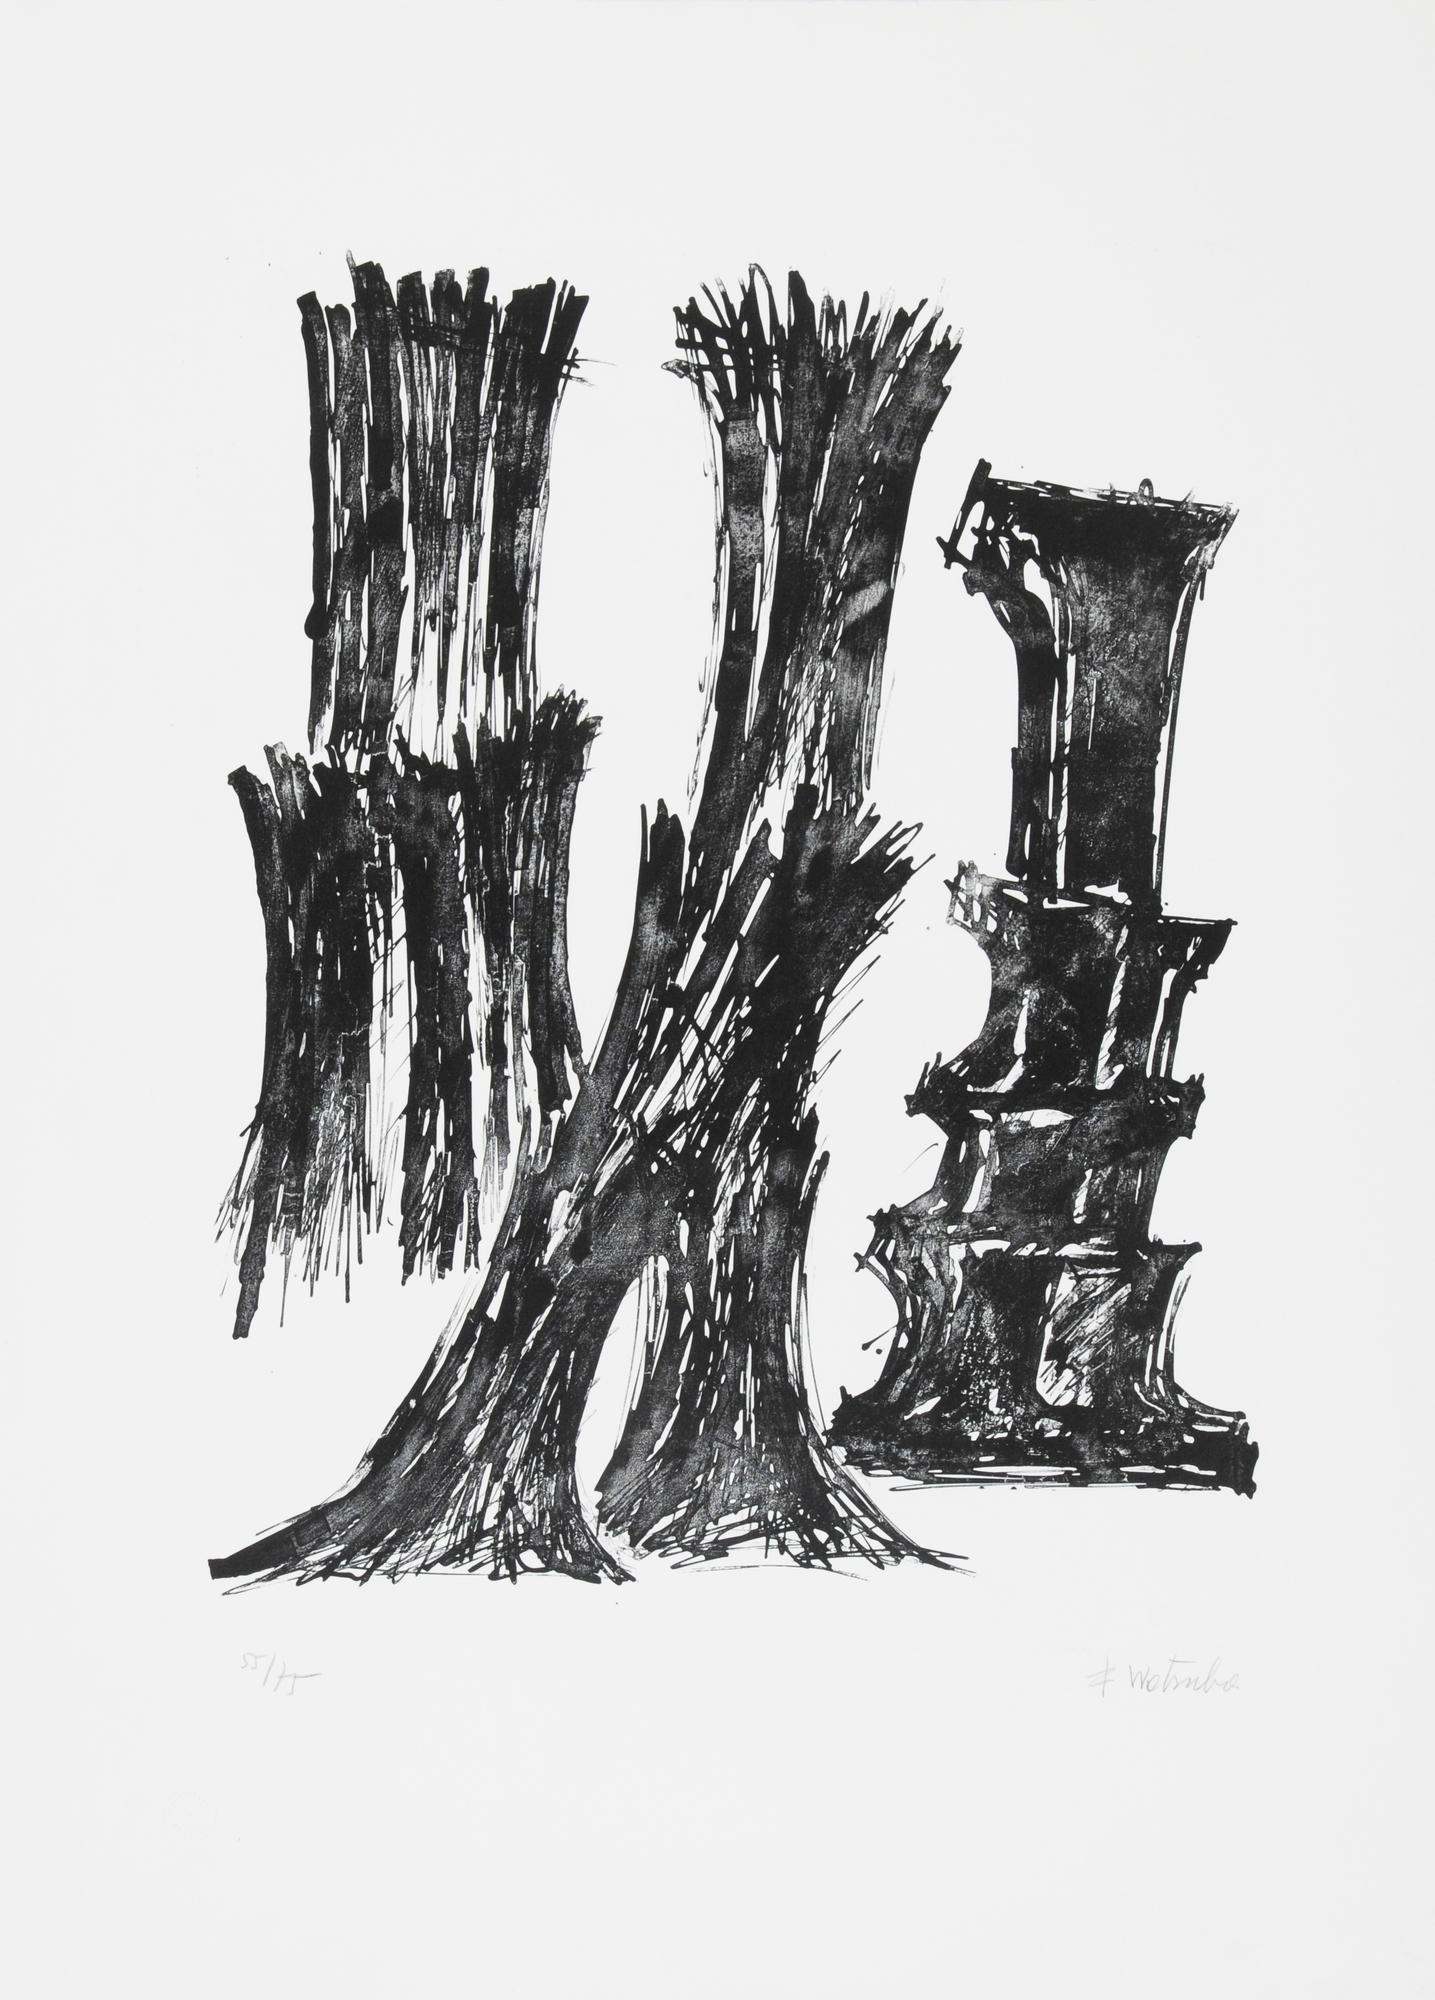 Wotruba Fritz, 2 sheets: Untitled